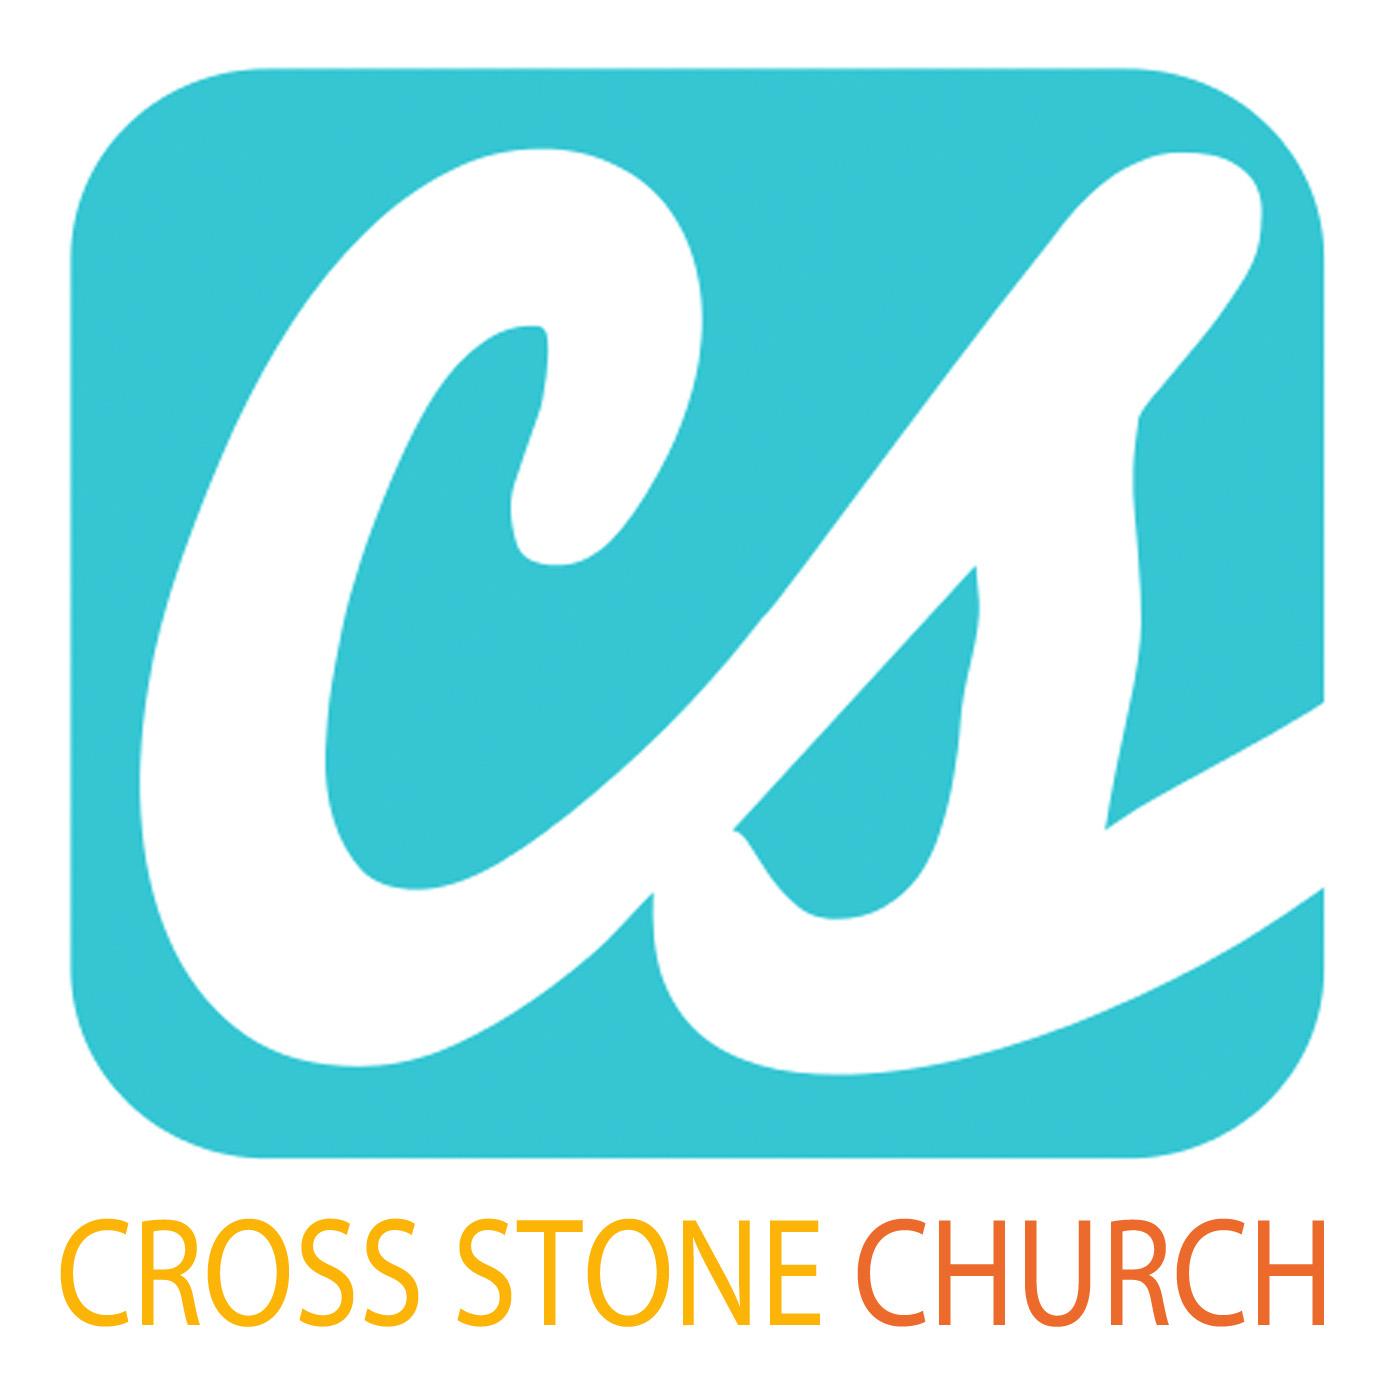 Cross Stone Church logo